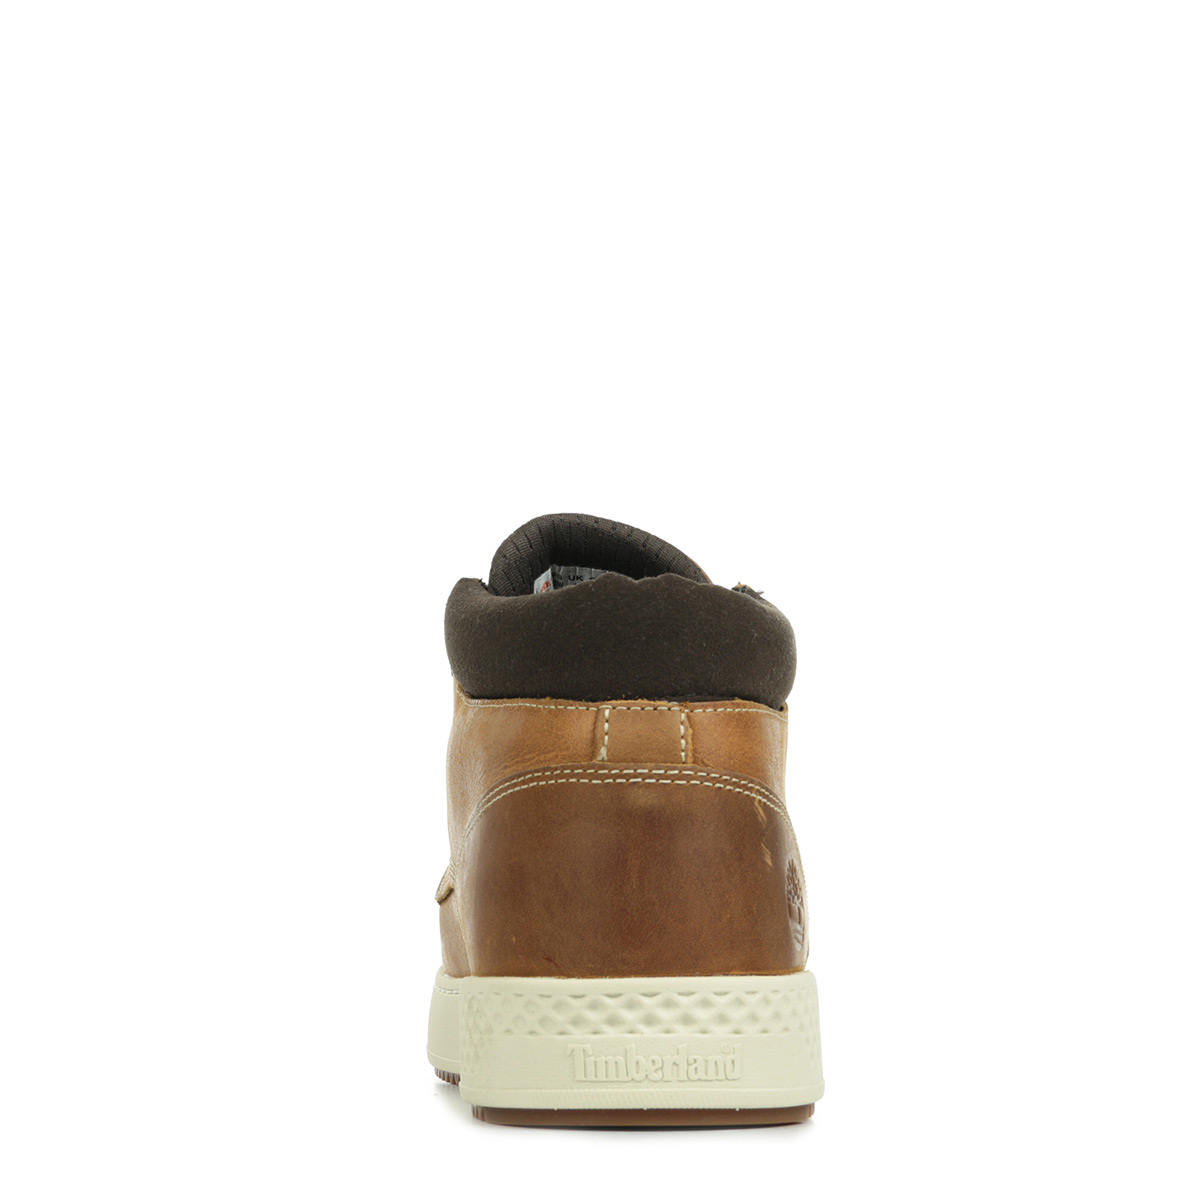 Détails sur Chaussures Boots Timberland homme Cityroam Cupsole Chukka Wheat taille Beige